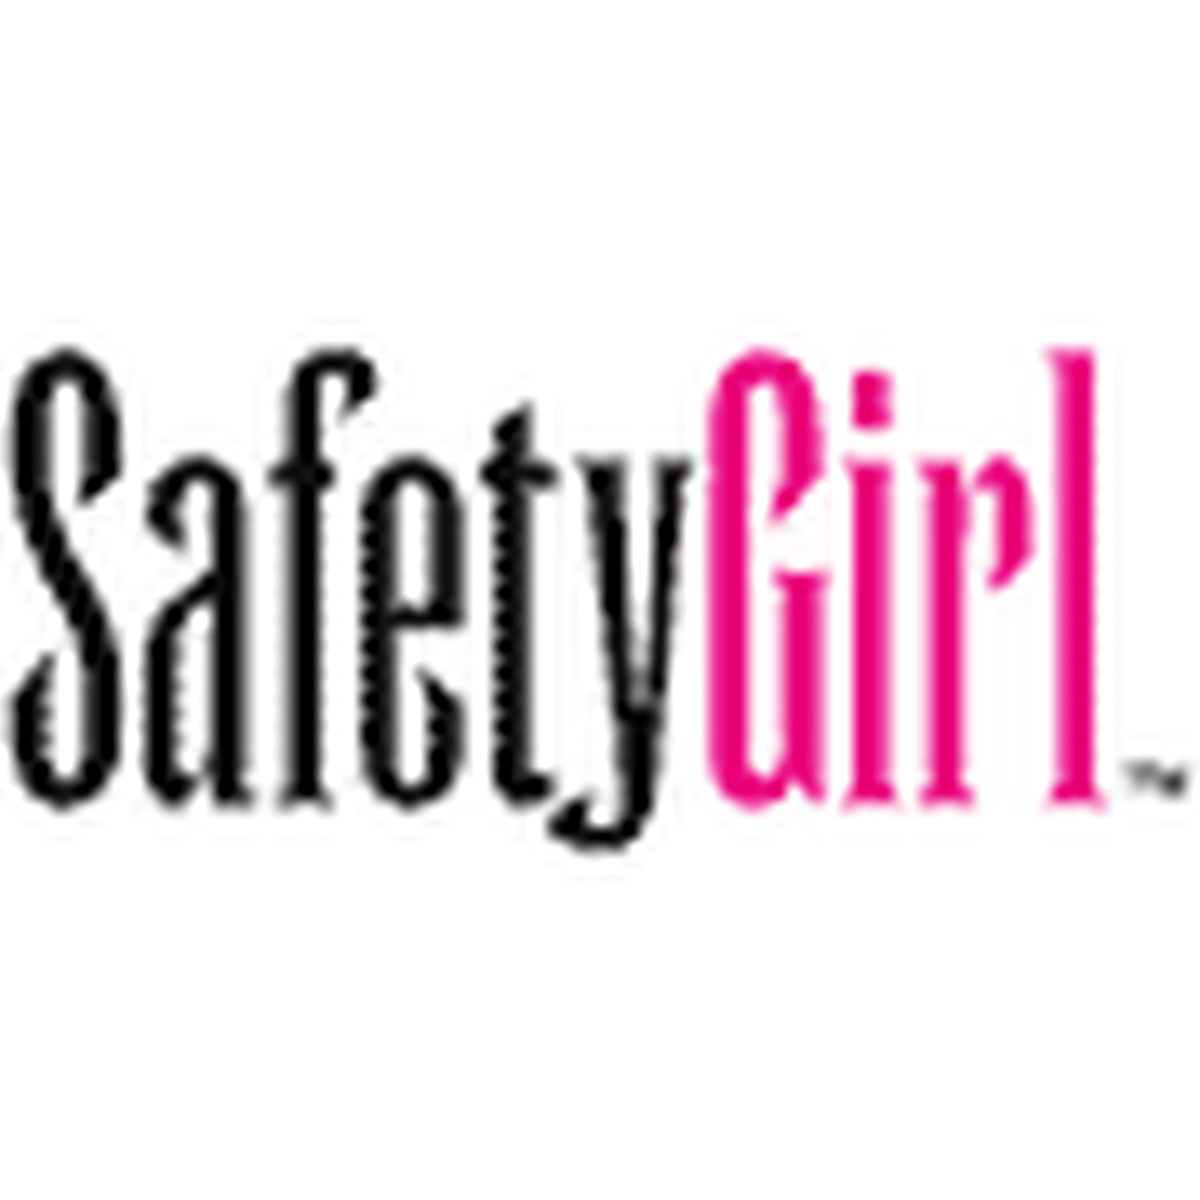 Safety Girl Pants